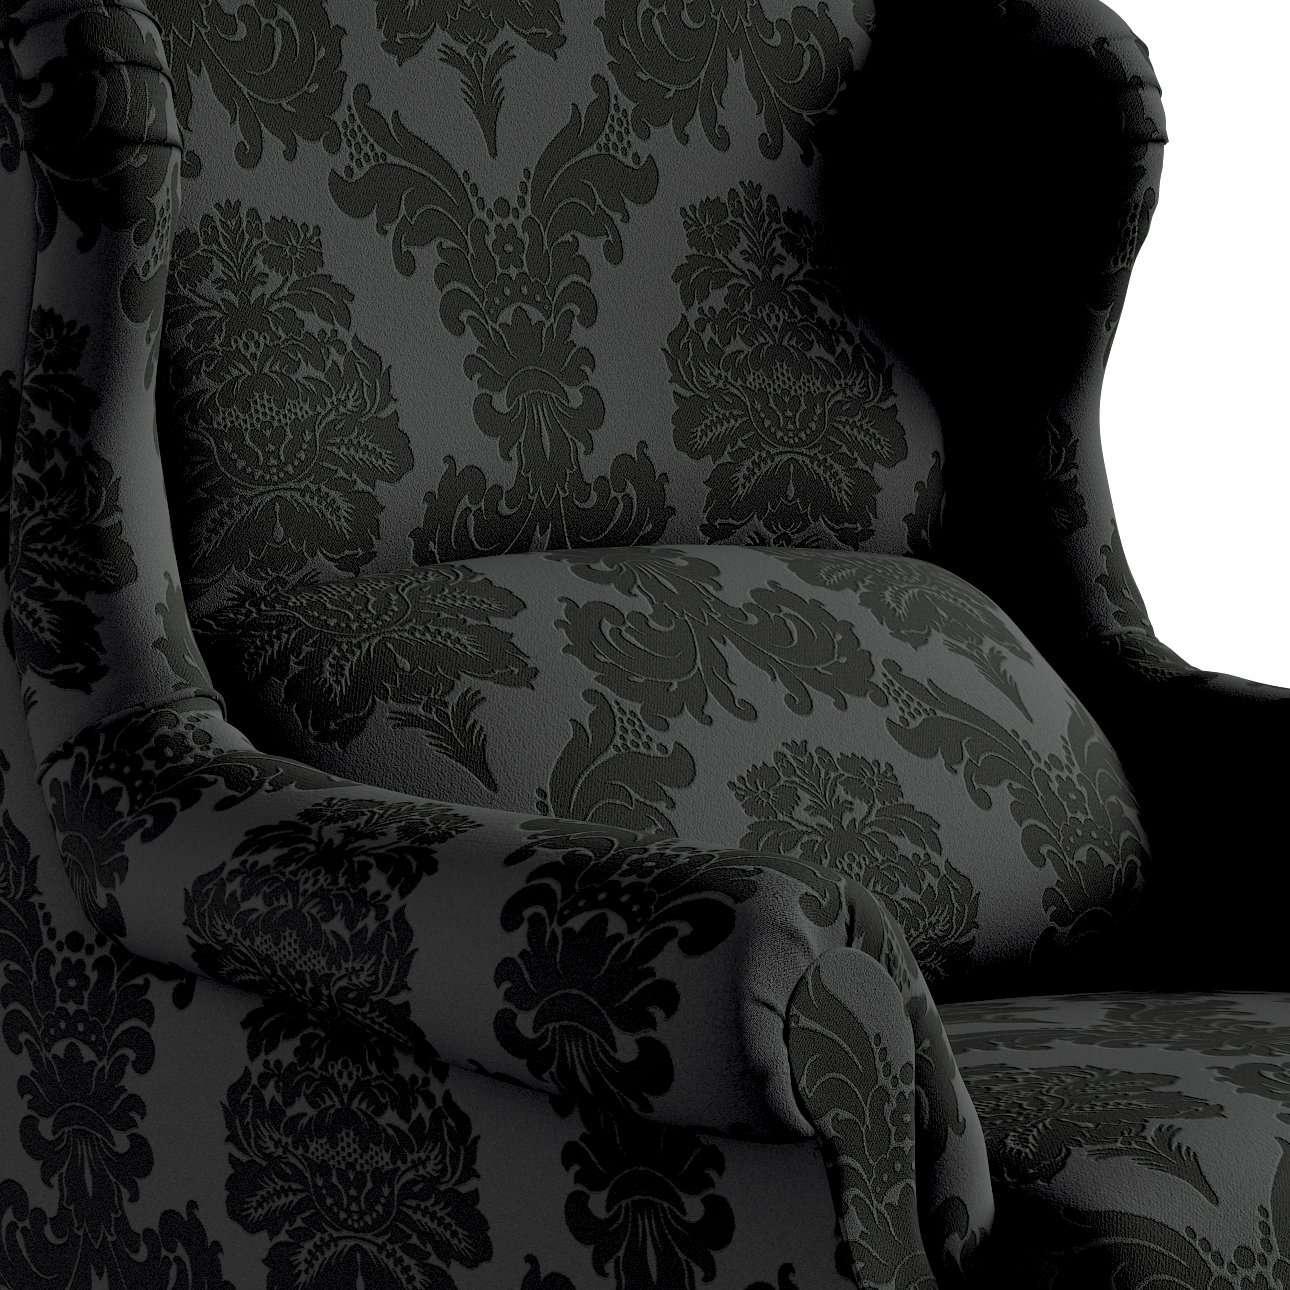 Stilingas Dekoria fotelis 63 x 115 cm kolekcijoje Damasco, audinys: 613-32